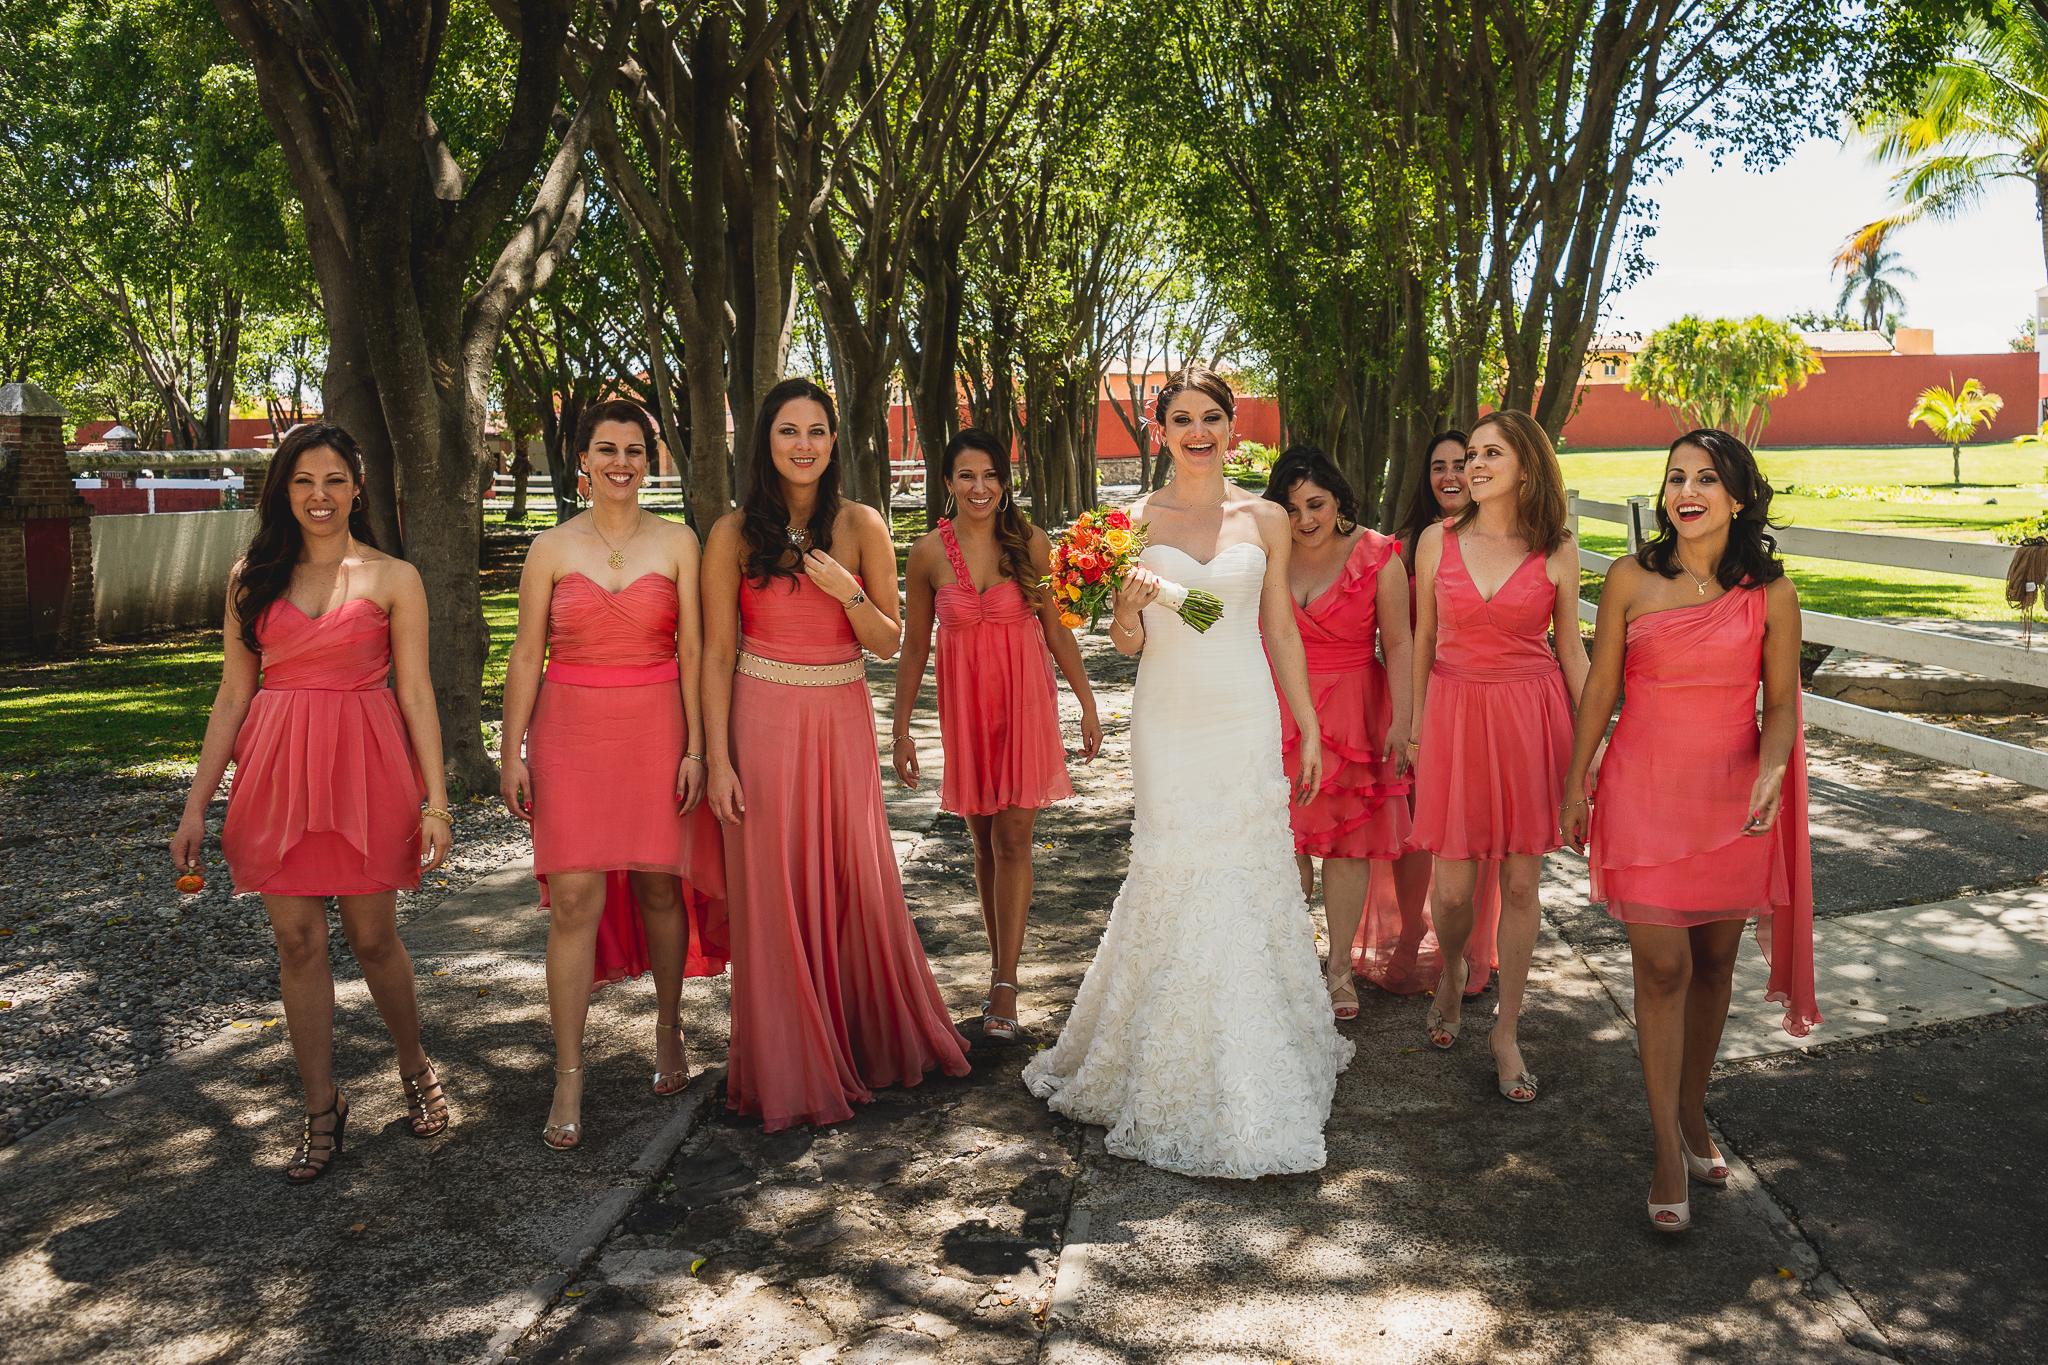 wedding-photography-mexico-quinta-rubelinas-46.jpg